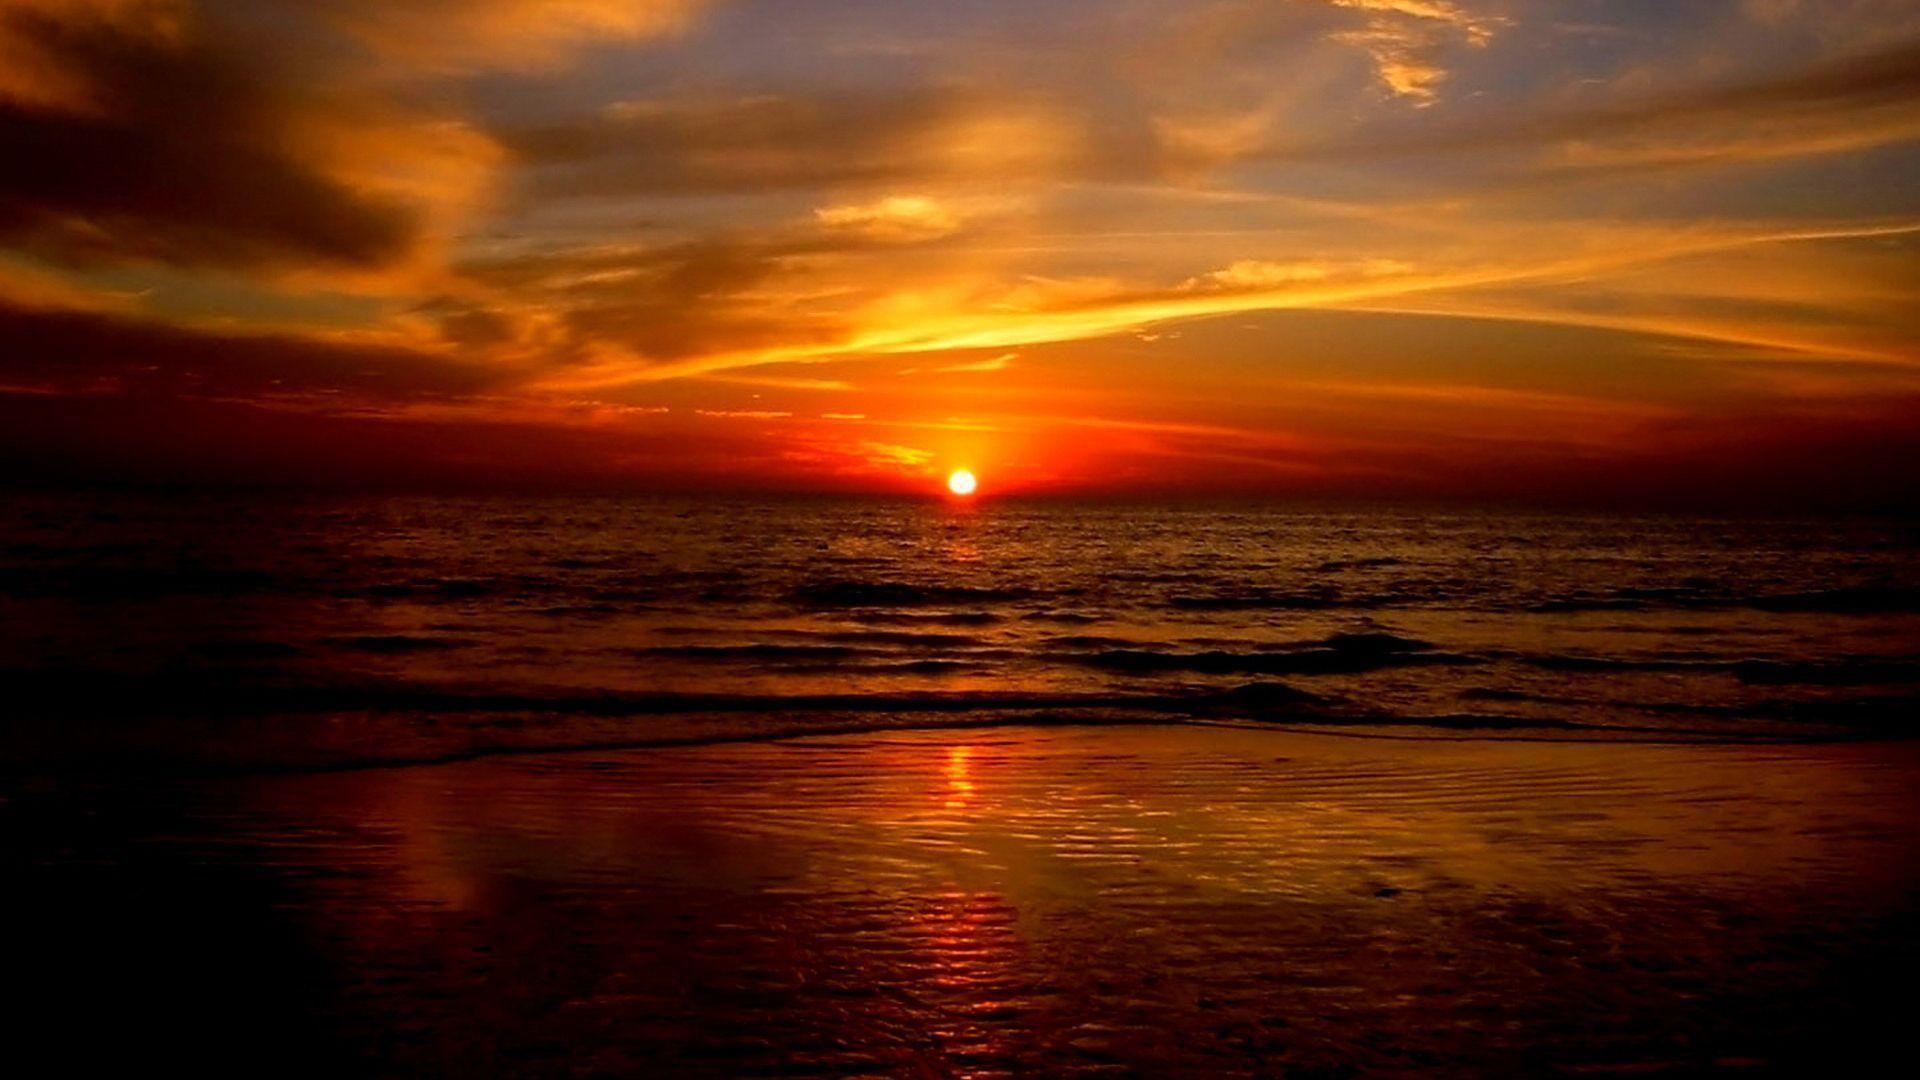 Ocean Sunset wallpaper image